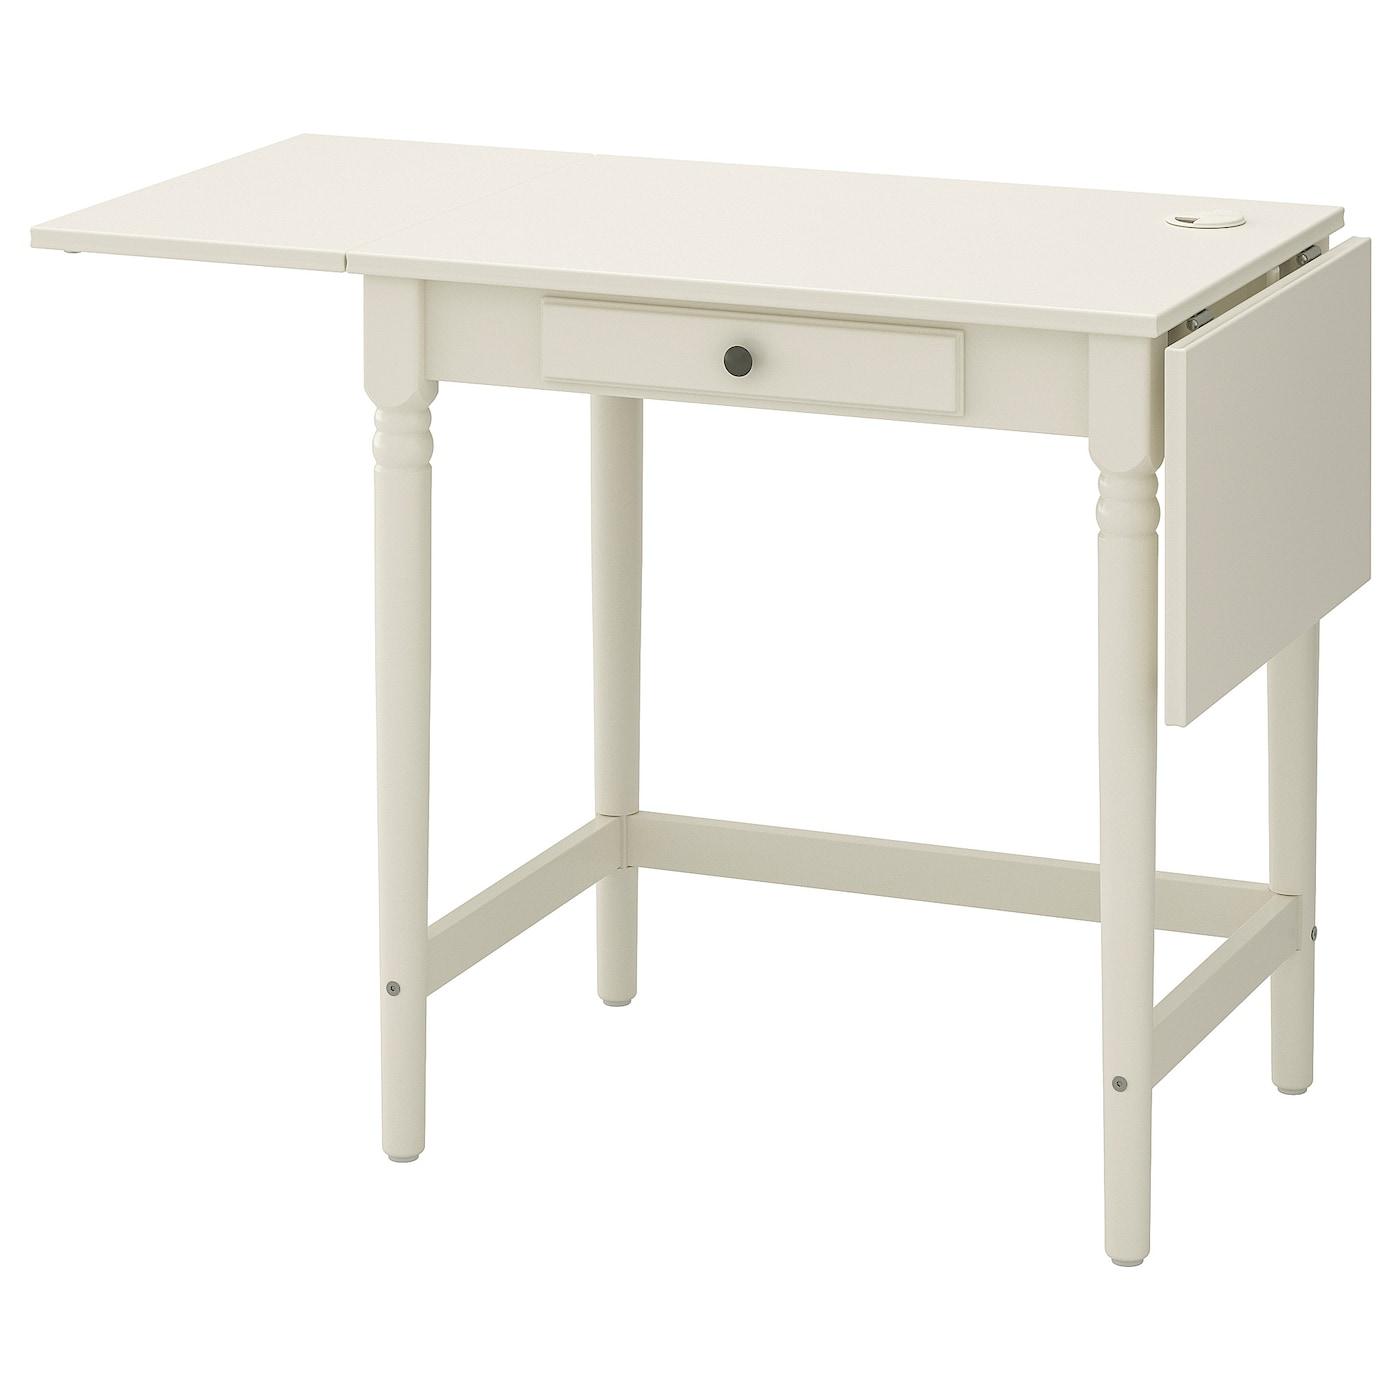 Schreibtisch Weiss Ikea 2021